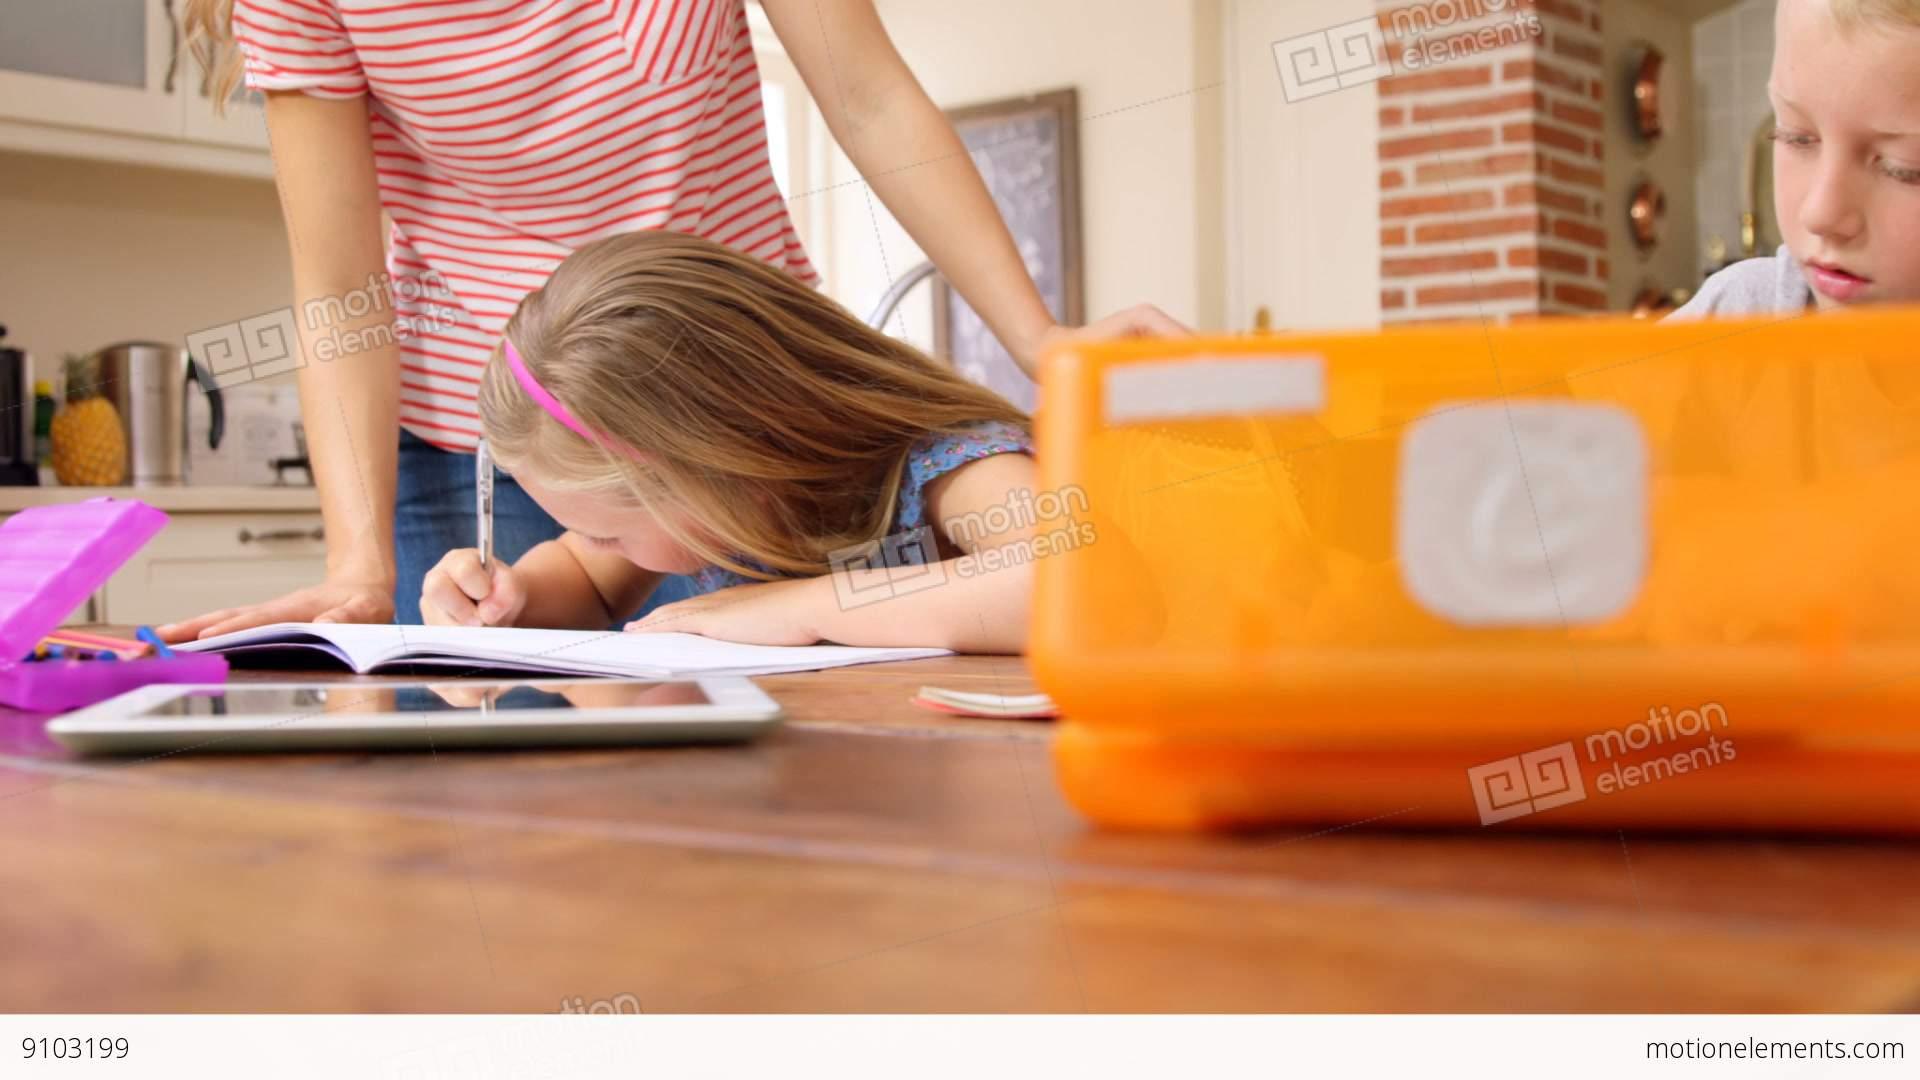 parents and children doing homework together banco de